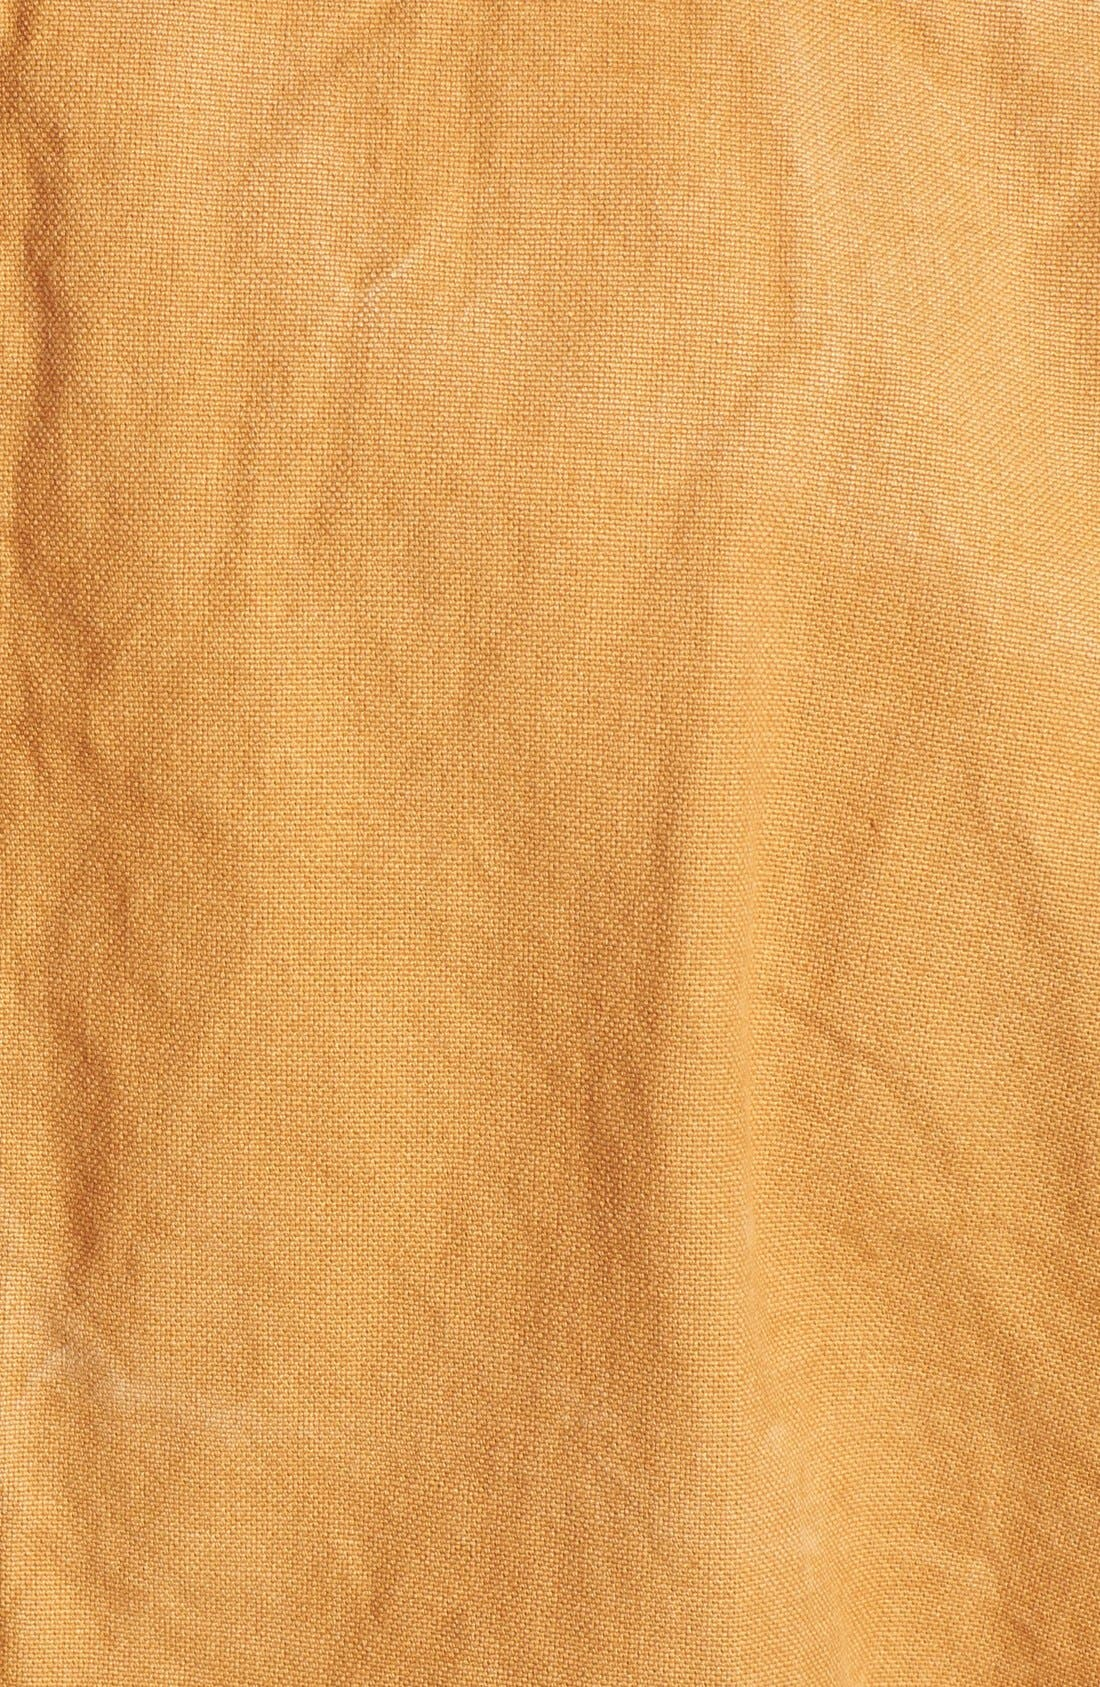 Alternate Image 3  - Scotch & Soda Barn Jacket